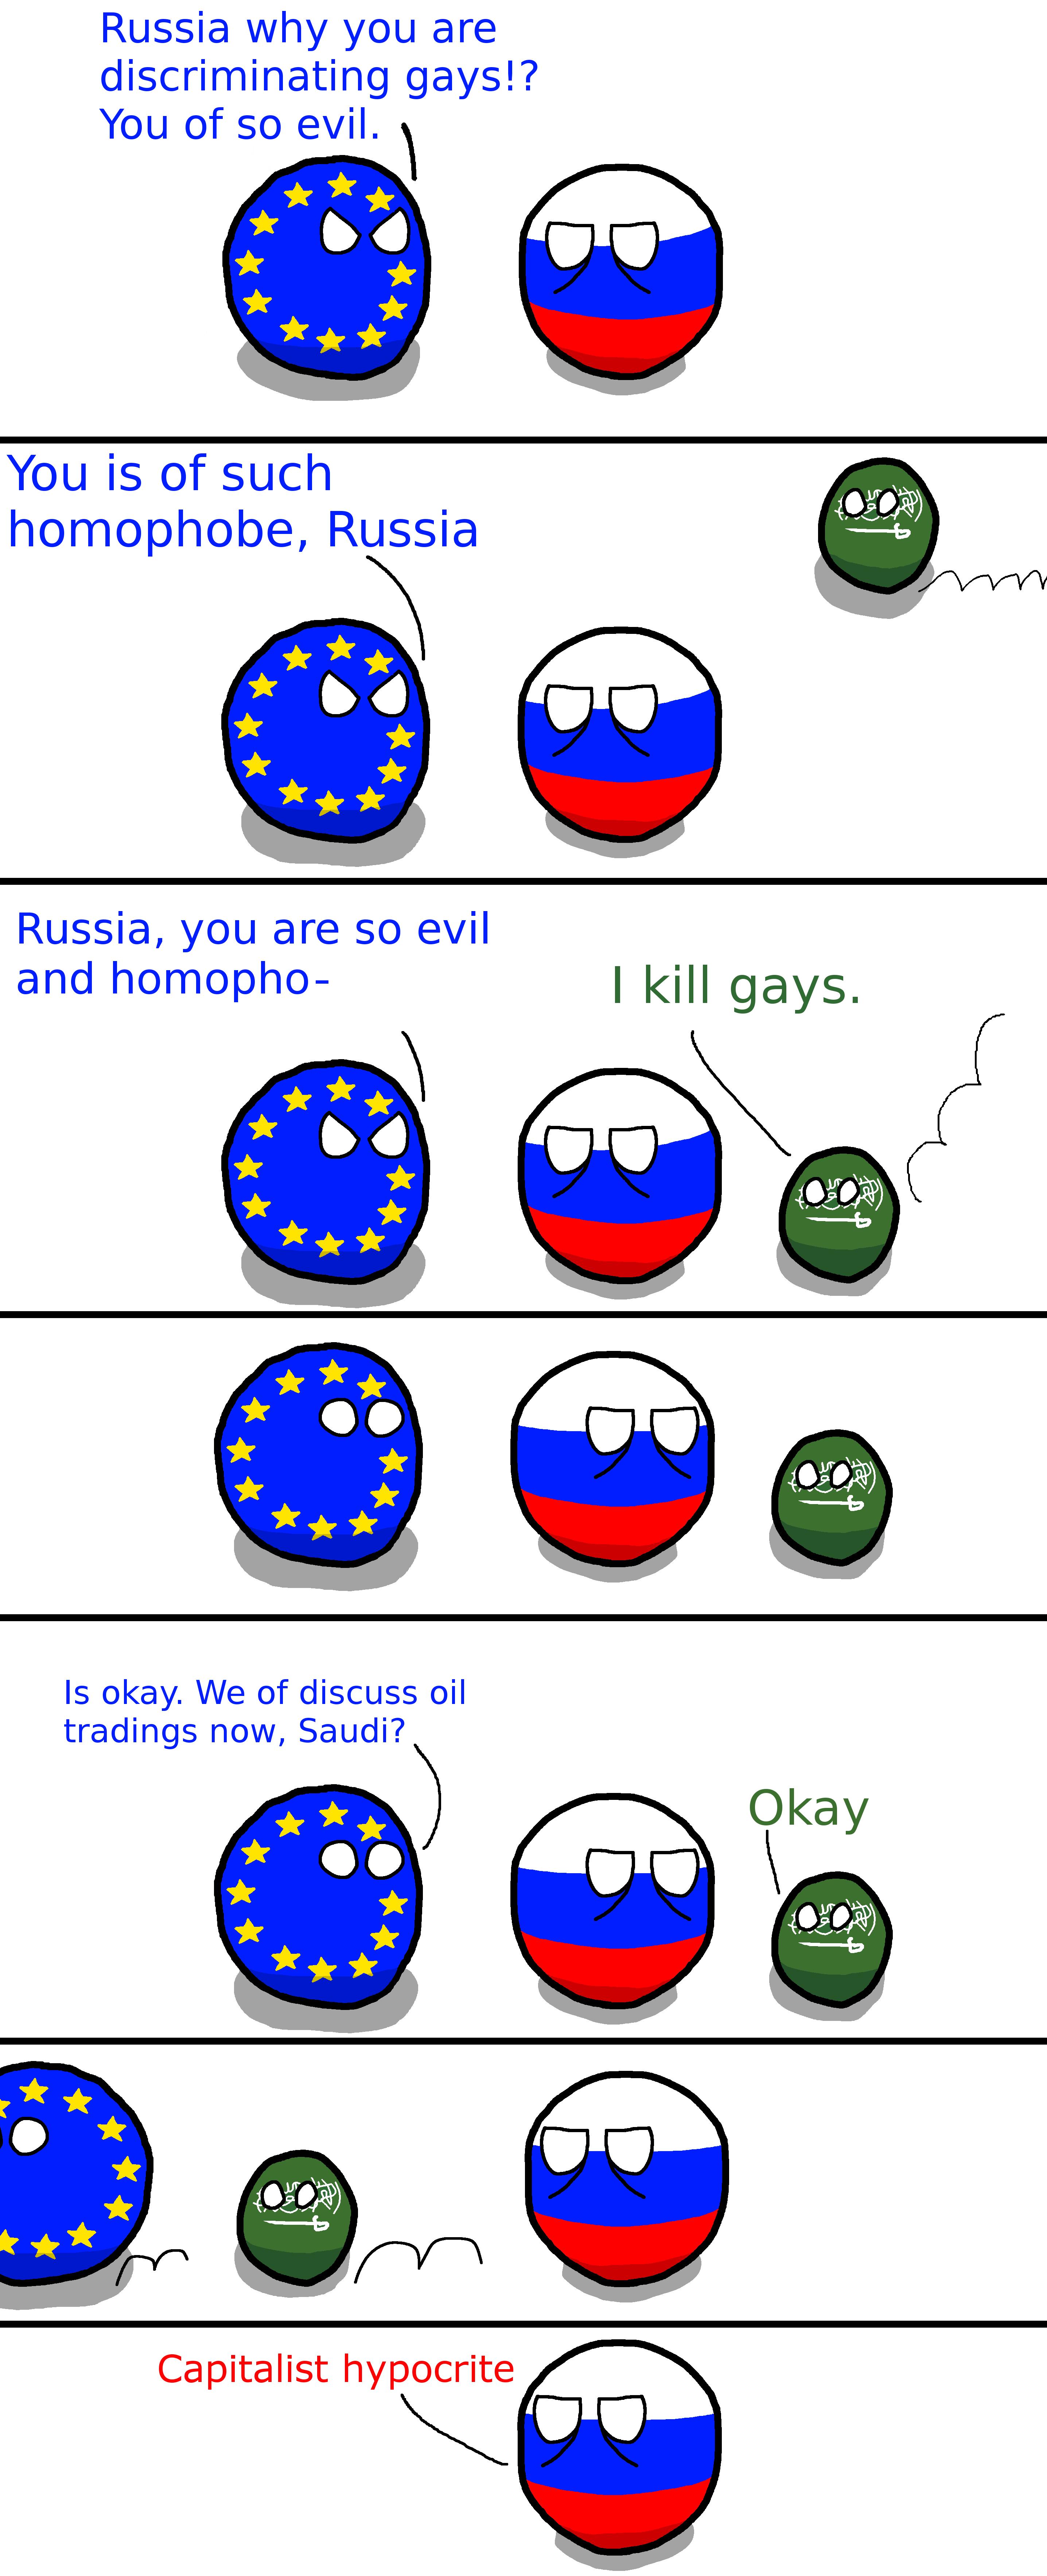 Capitalist Hypocrites